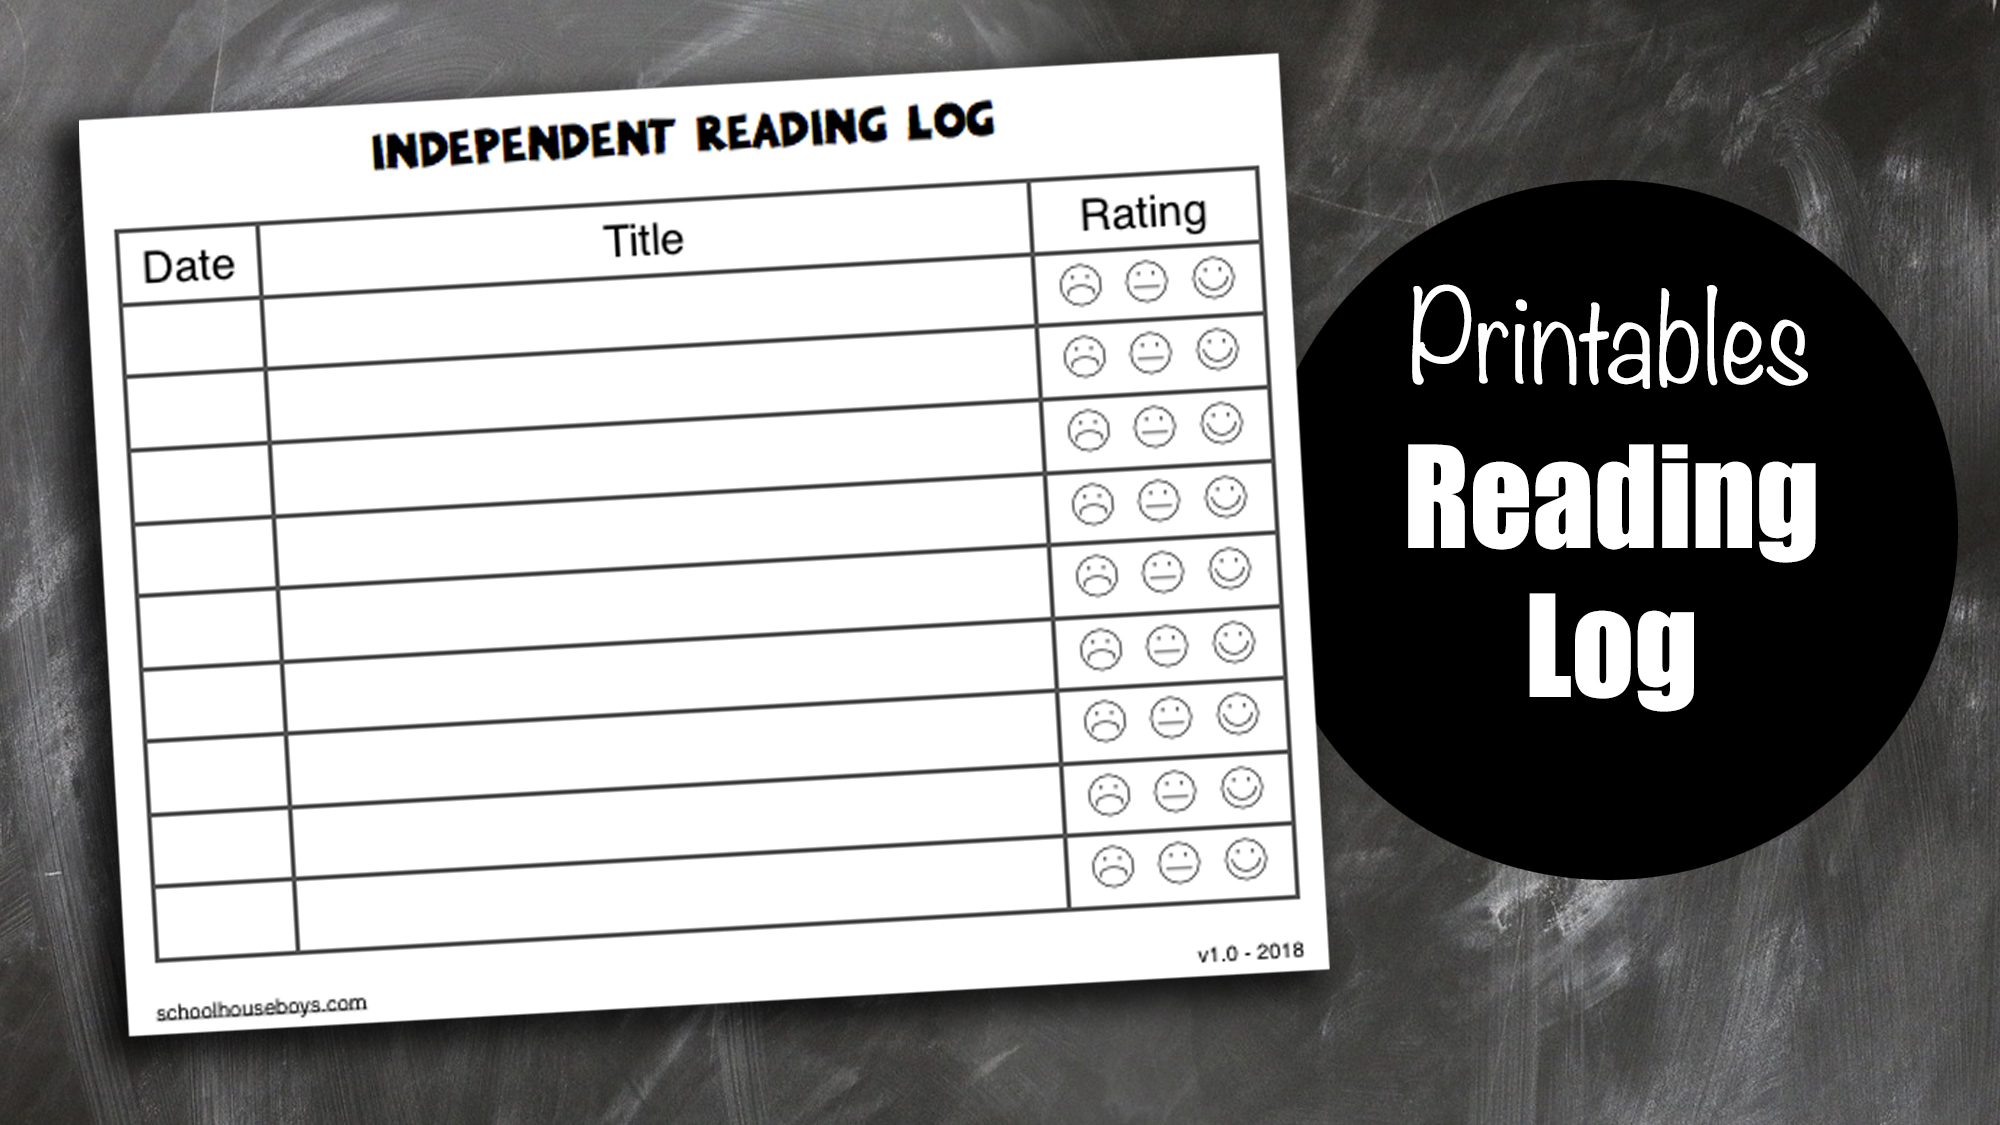 Simple Reading Log Free Printable Schoolhouse Boys